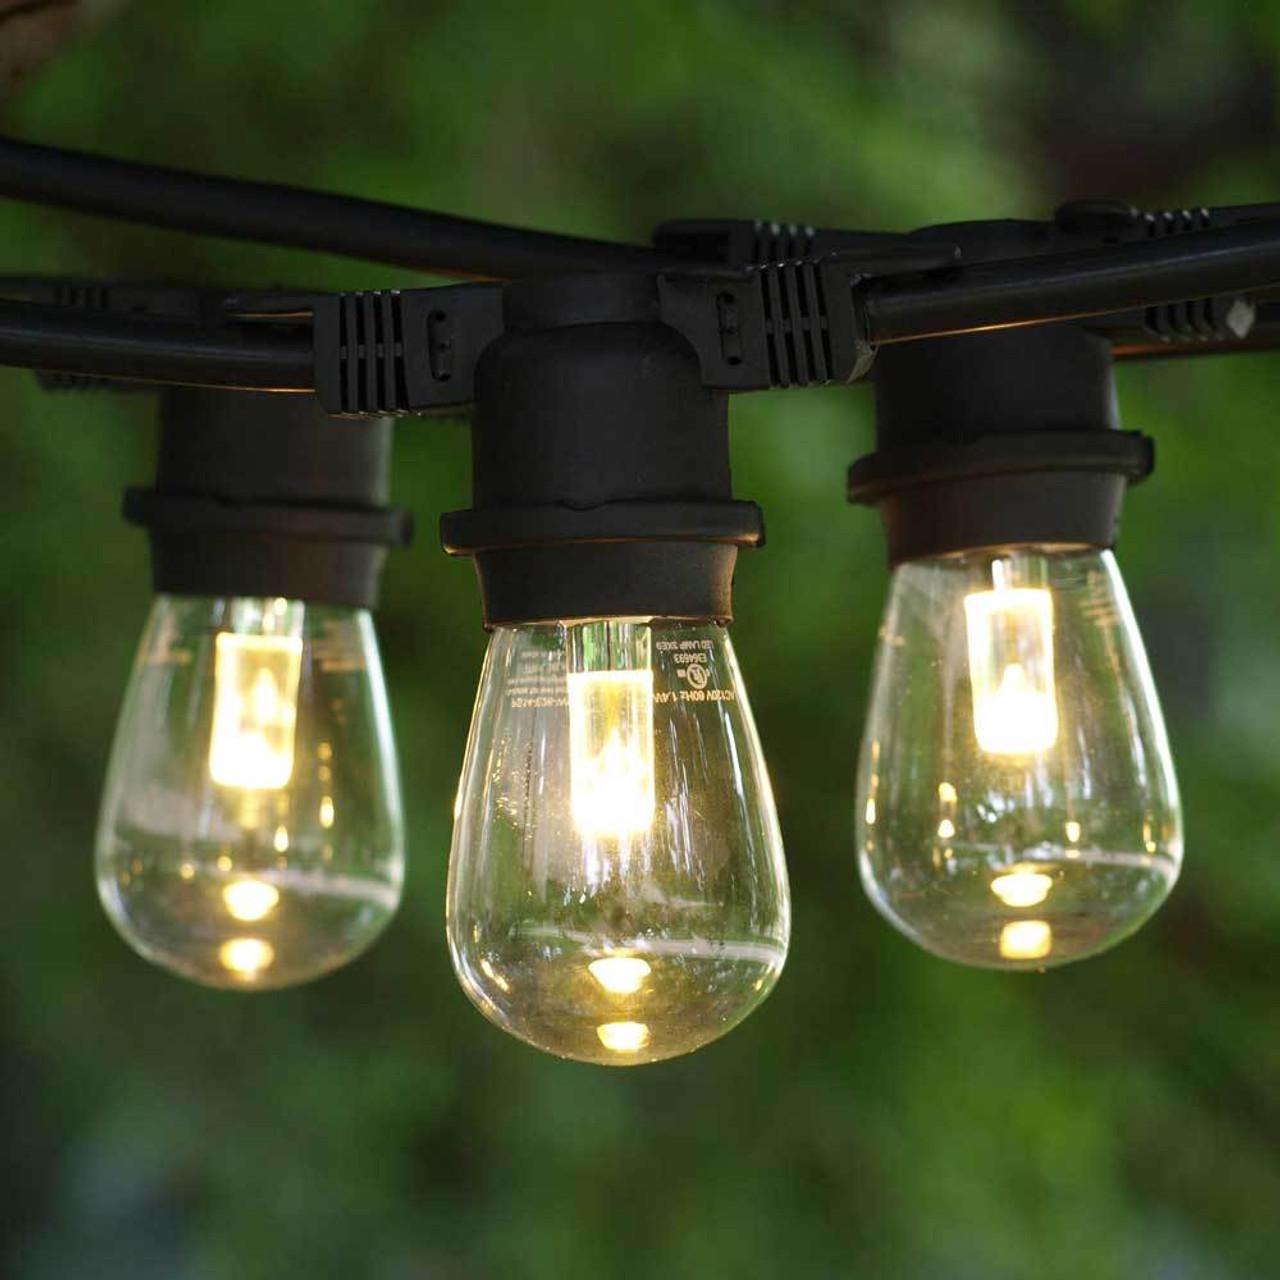 Commercial Medium LED String Lights